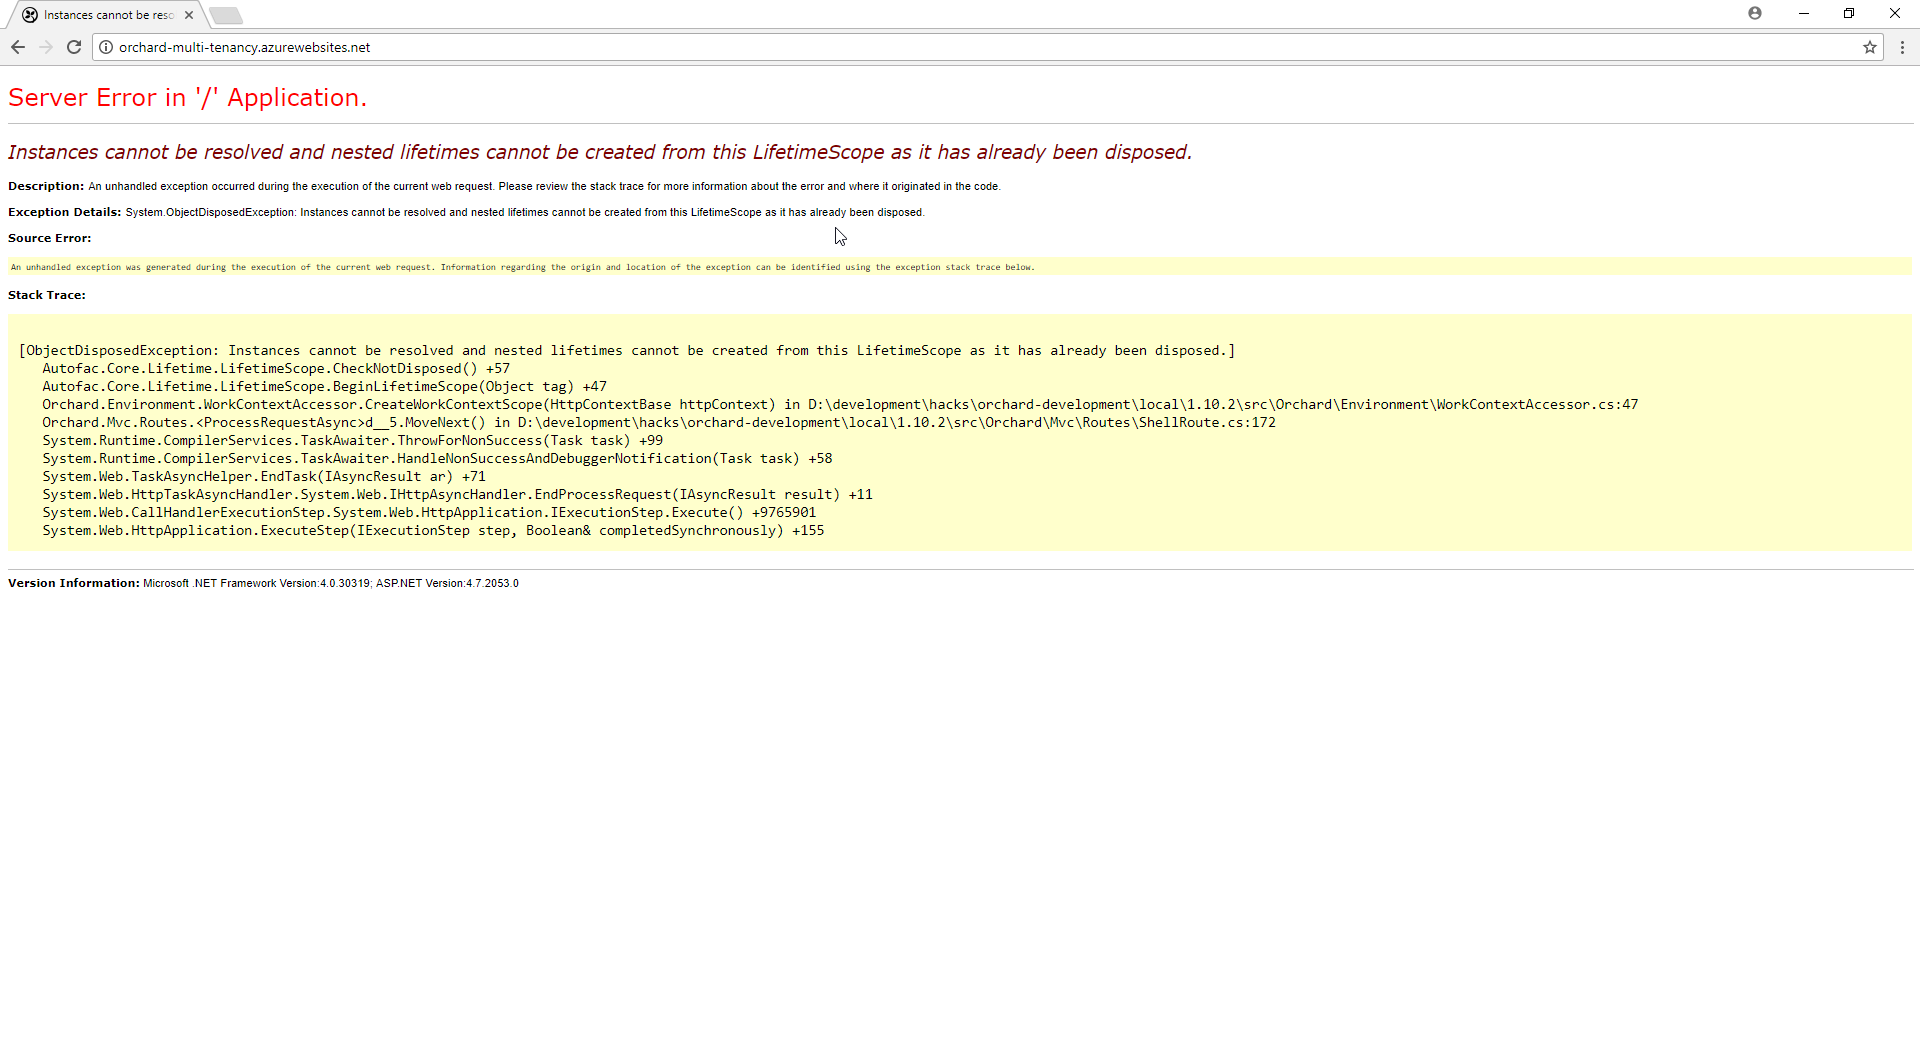 Site error when running Multi Tenancy · Issue #7875 · OrchardCMS